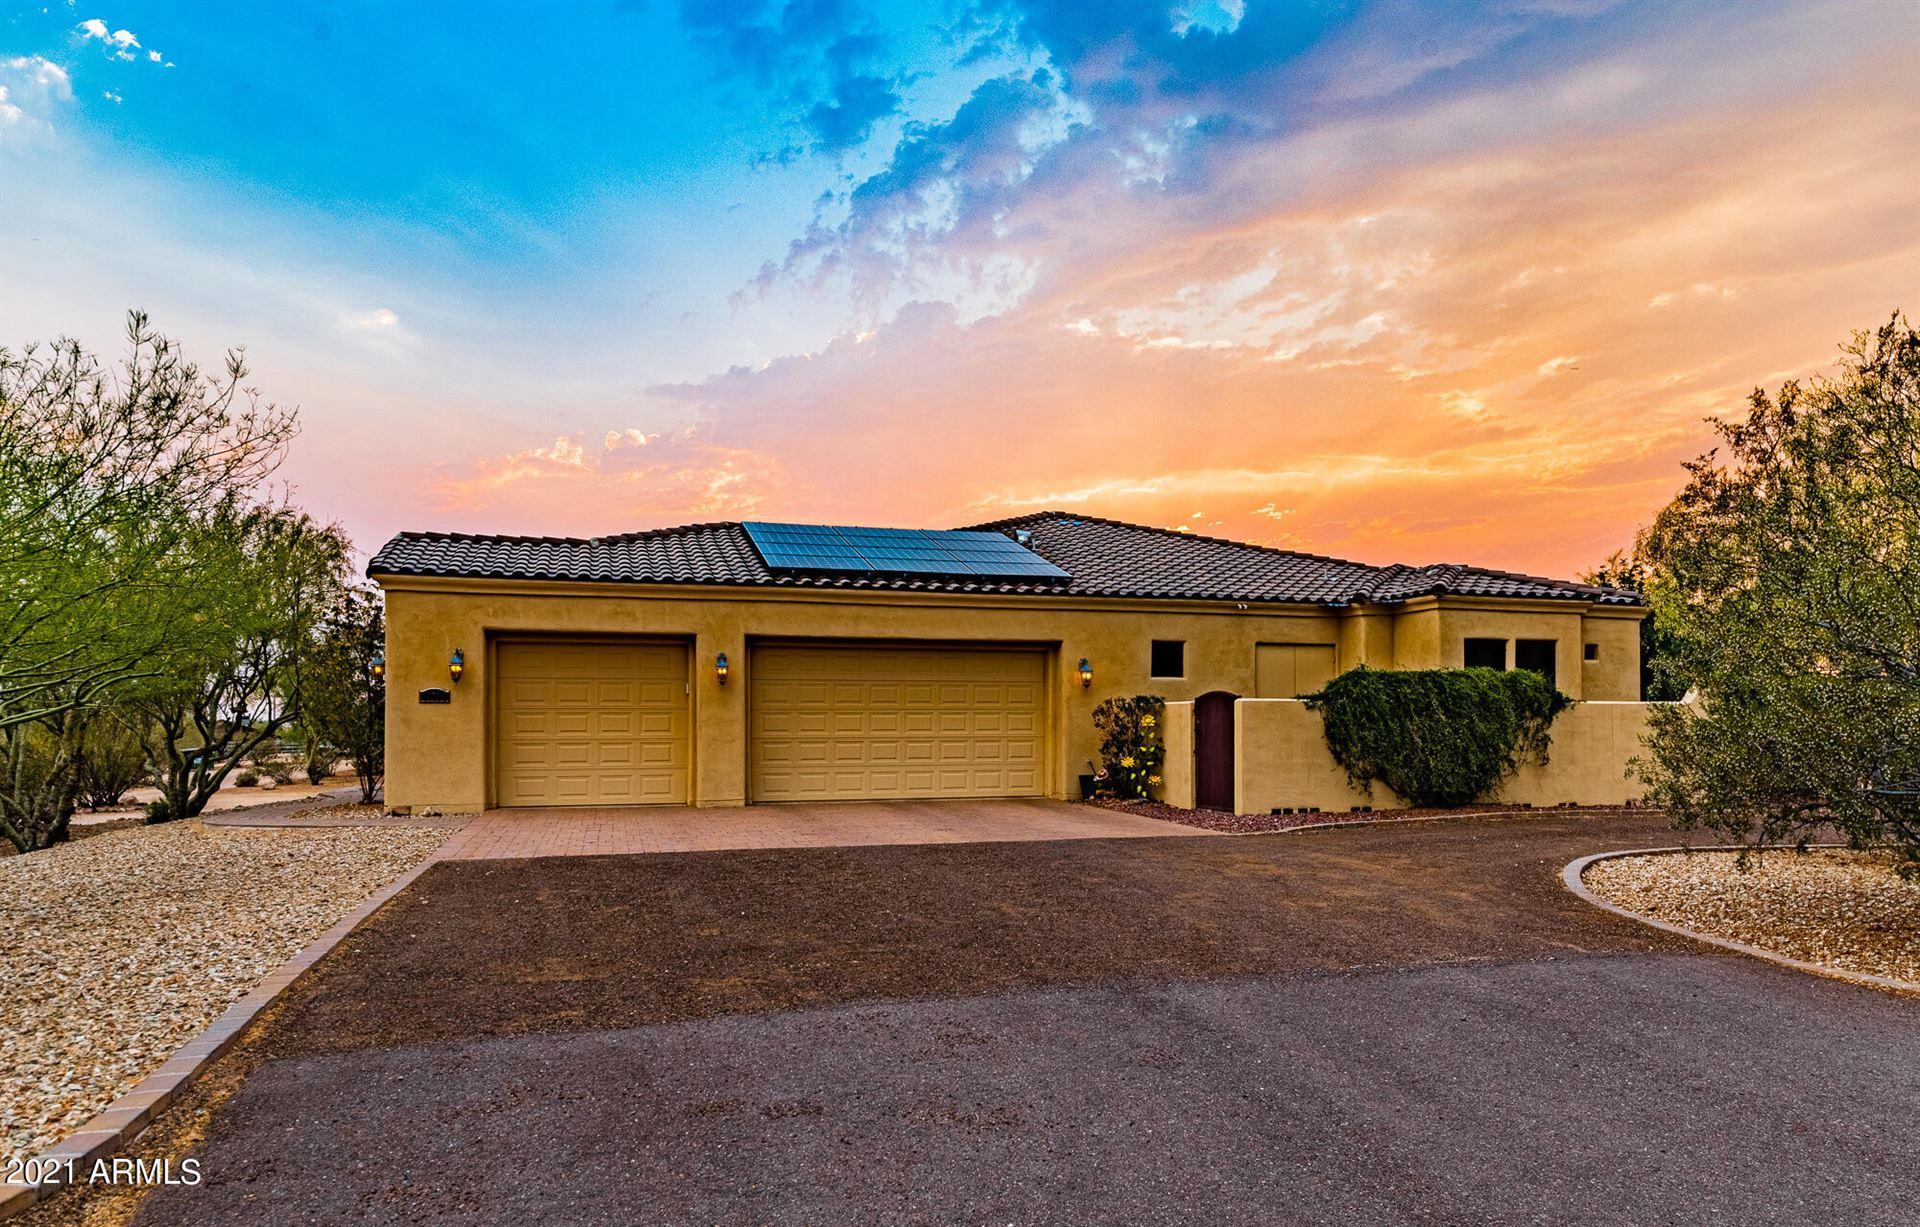 Photo of 38322 N 20TH Street, Desert Hills, AZ 85086 (MLS # 6251952)